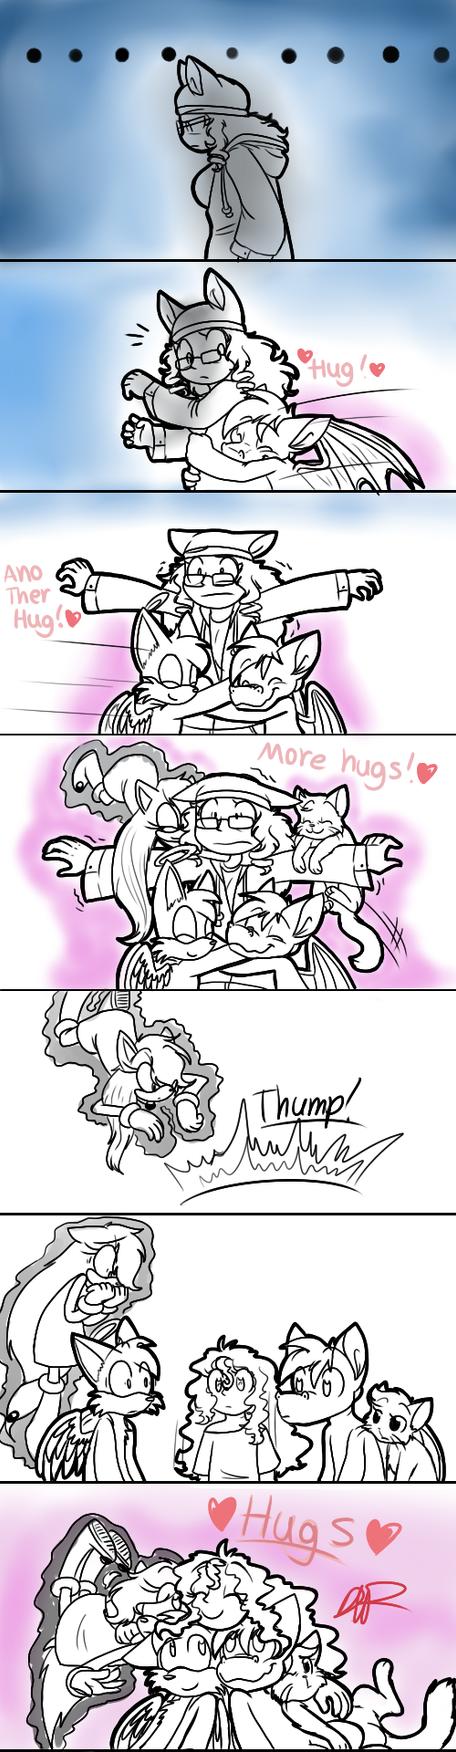 National Hug Day comic by payero01